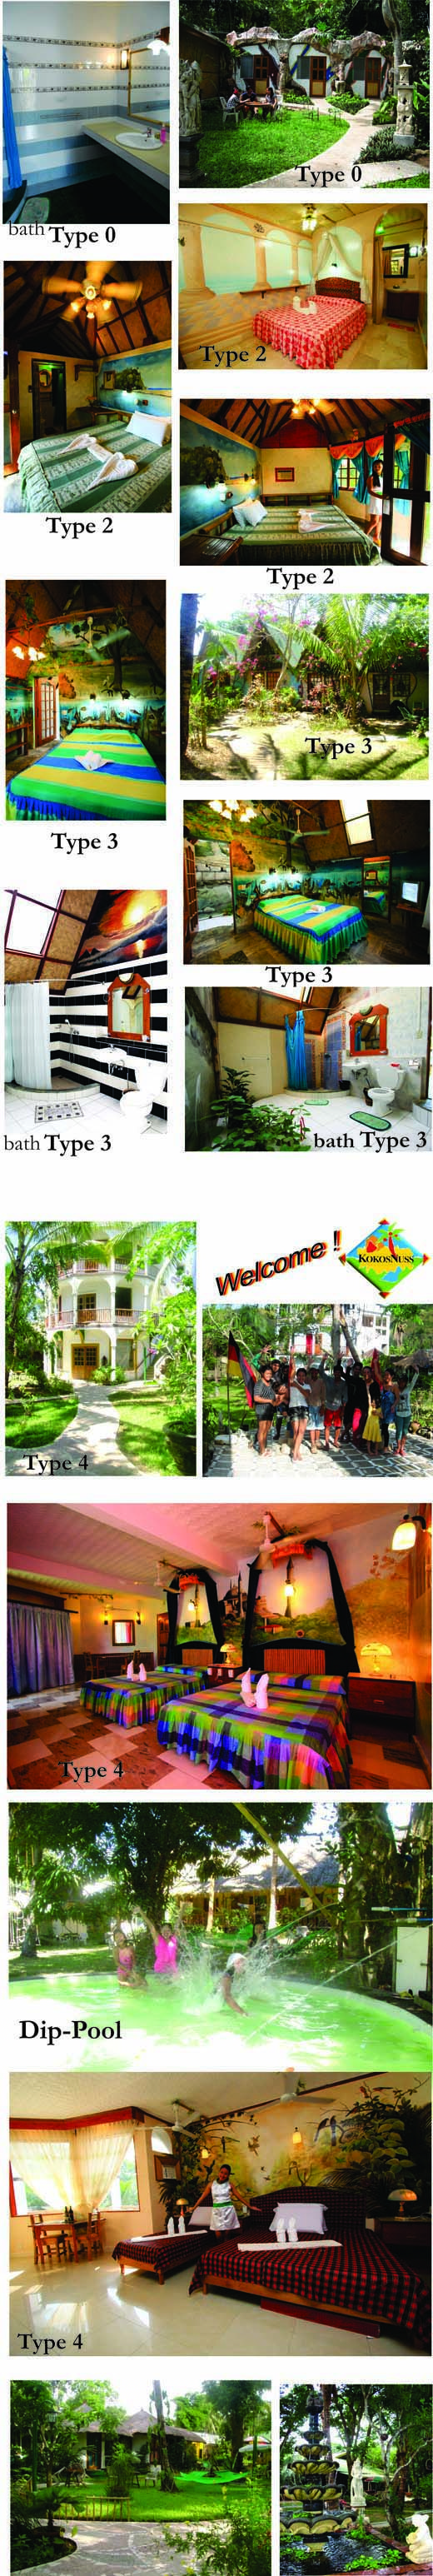 KokosNuss Resort, Coron, Busuanga Island, Palawan, Philippines Very Good Rates !!